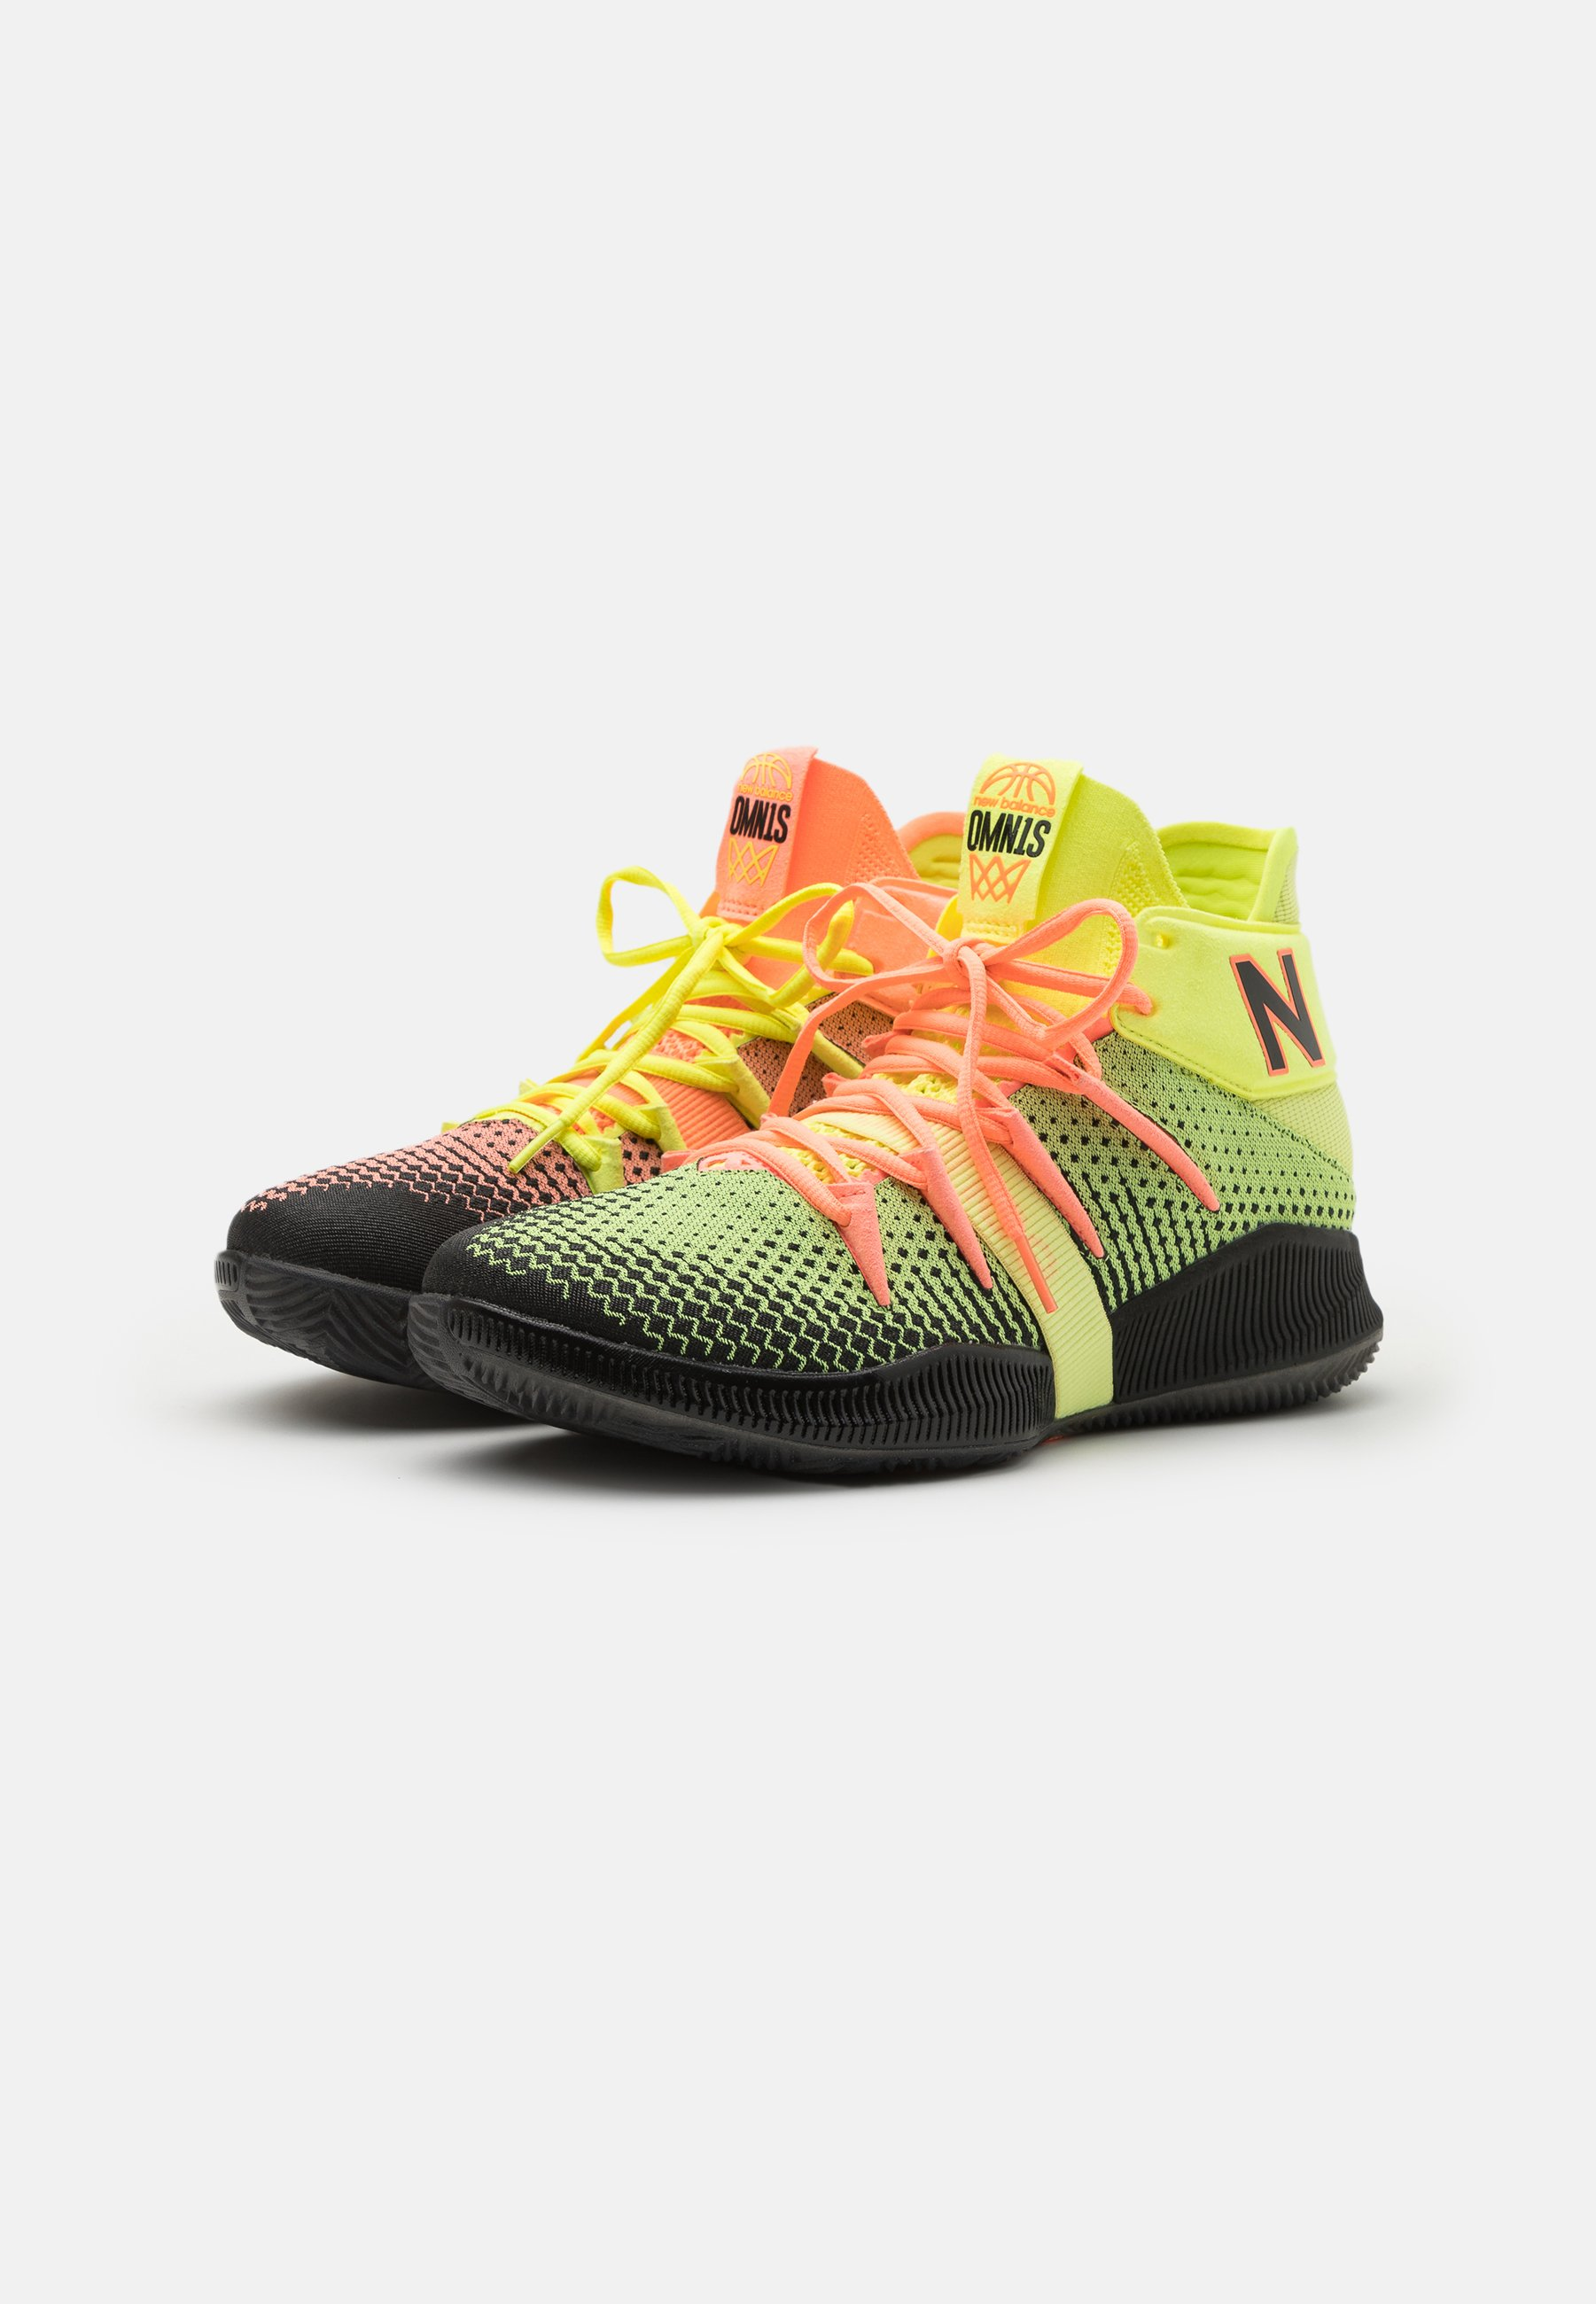 New Balance BBOMNX - Scarpe da basket - pink/black/fuxia - Zalando.it